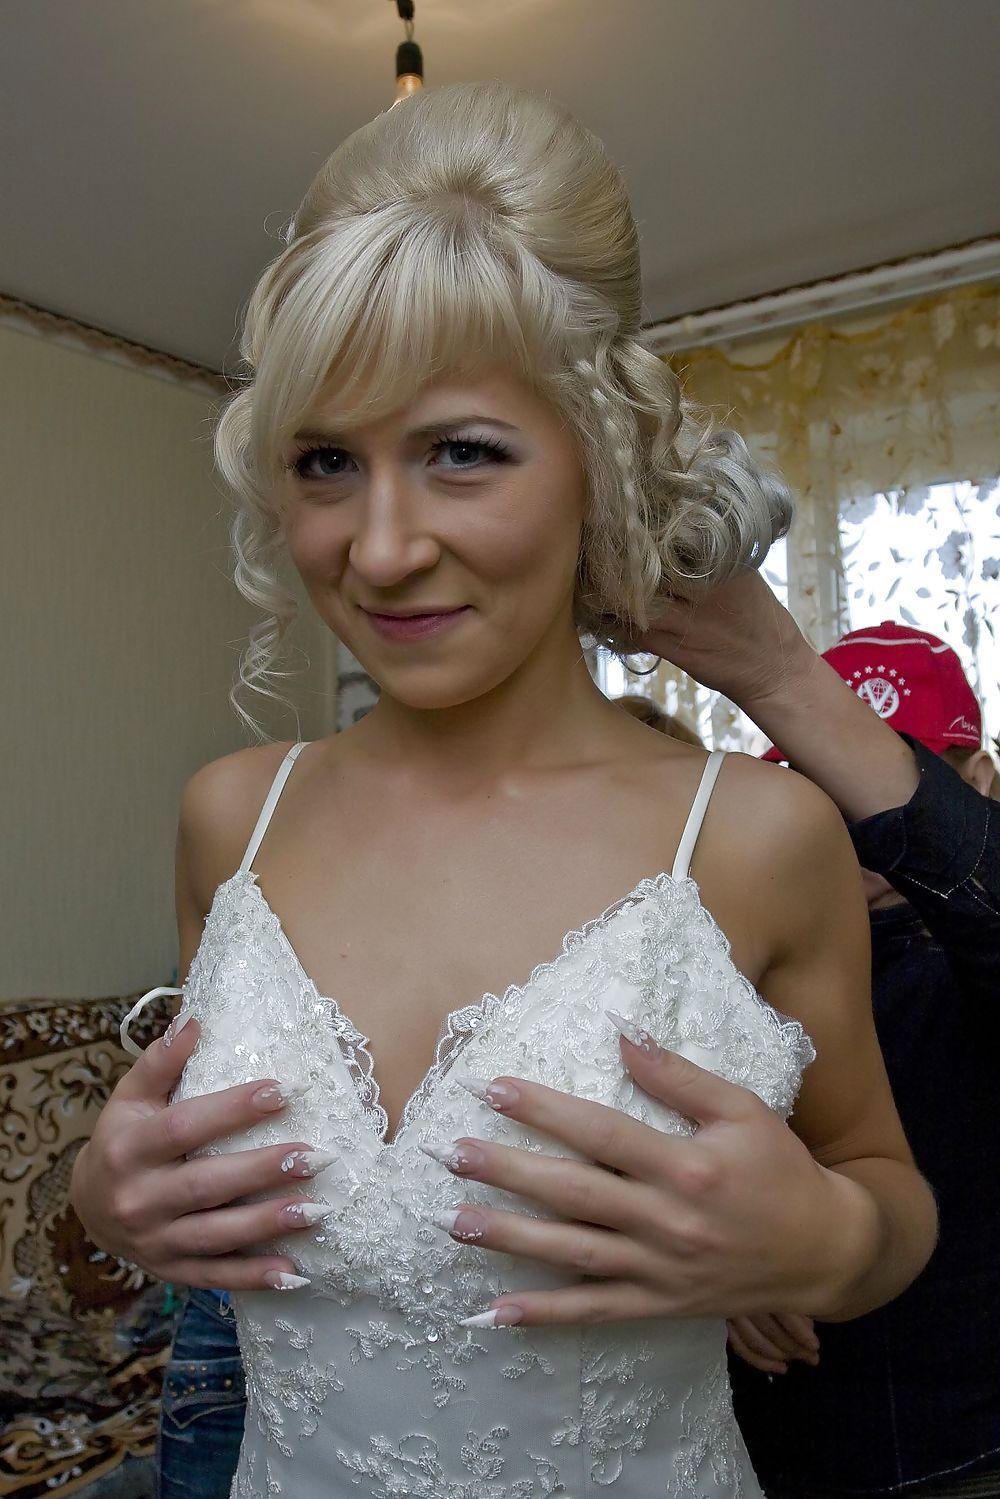 My Kinda Gurlz Thetransgenderbride Getting Her Ready